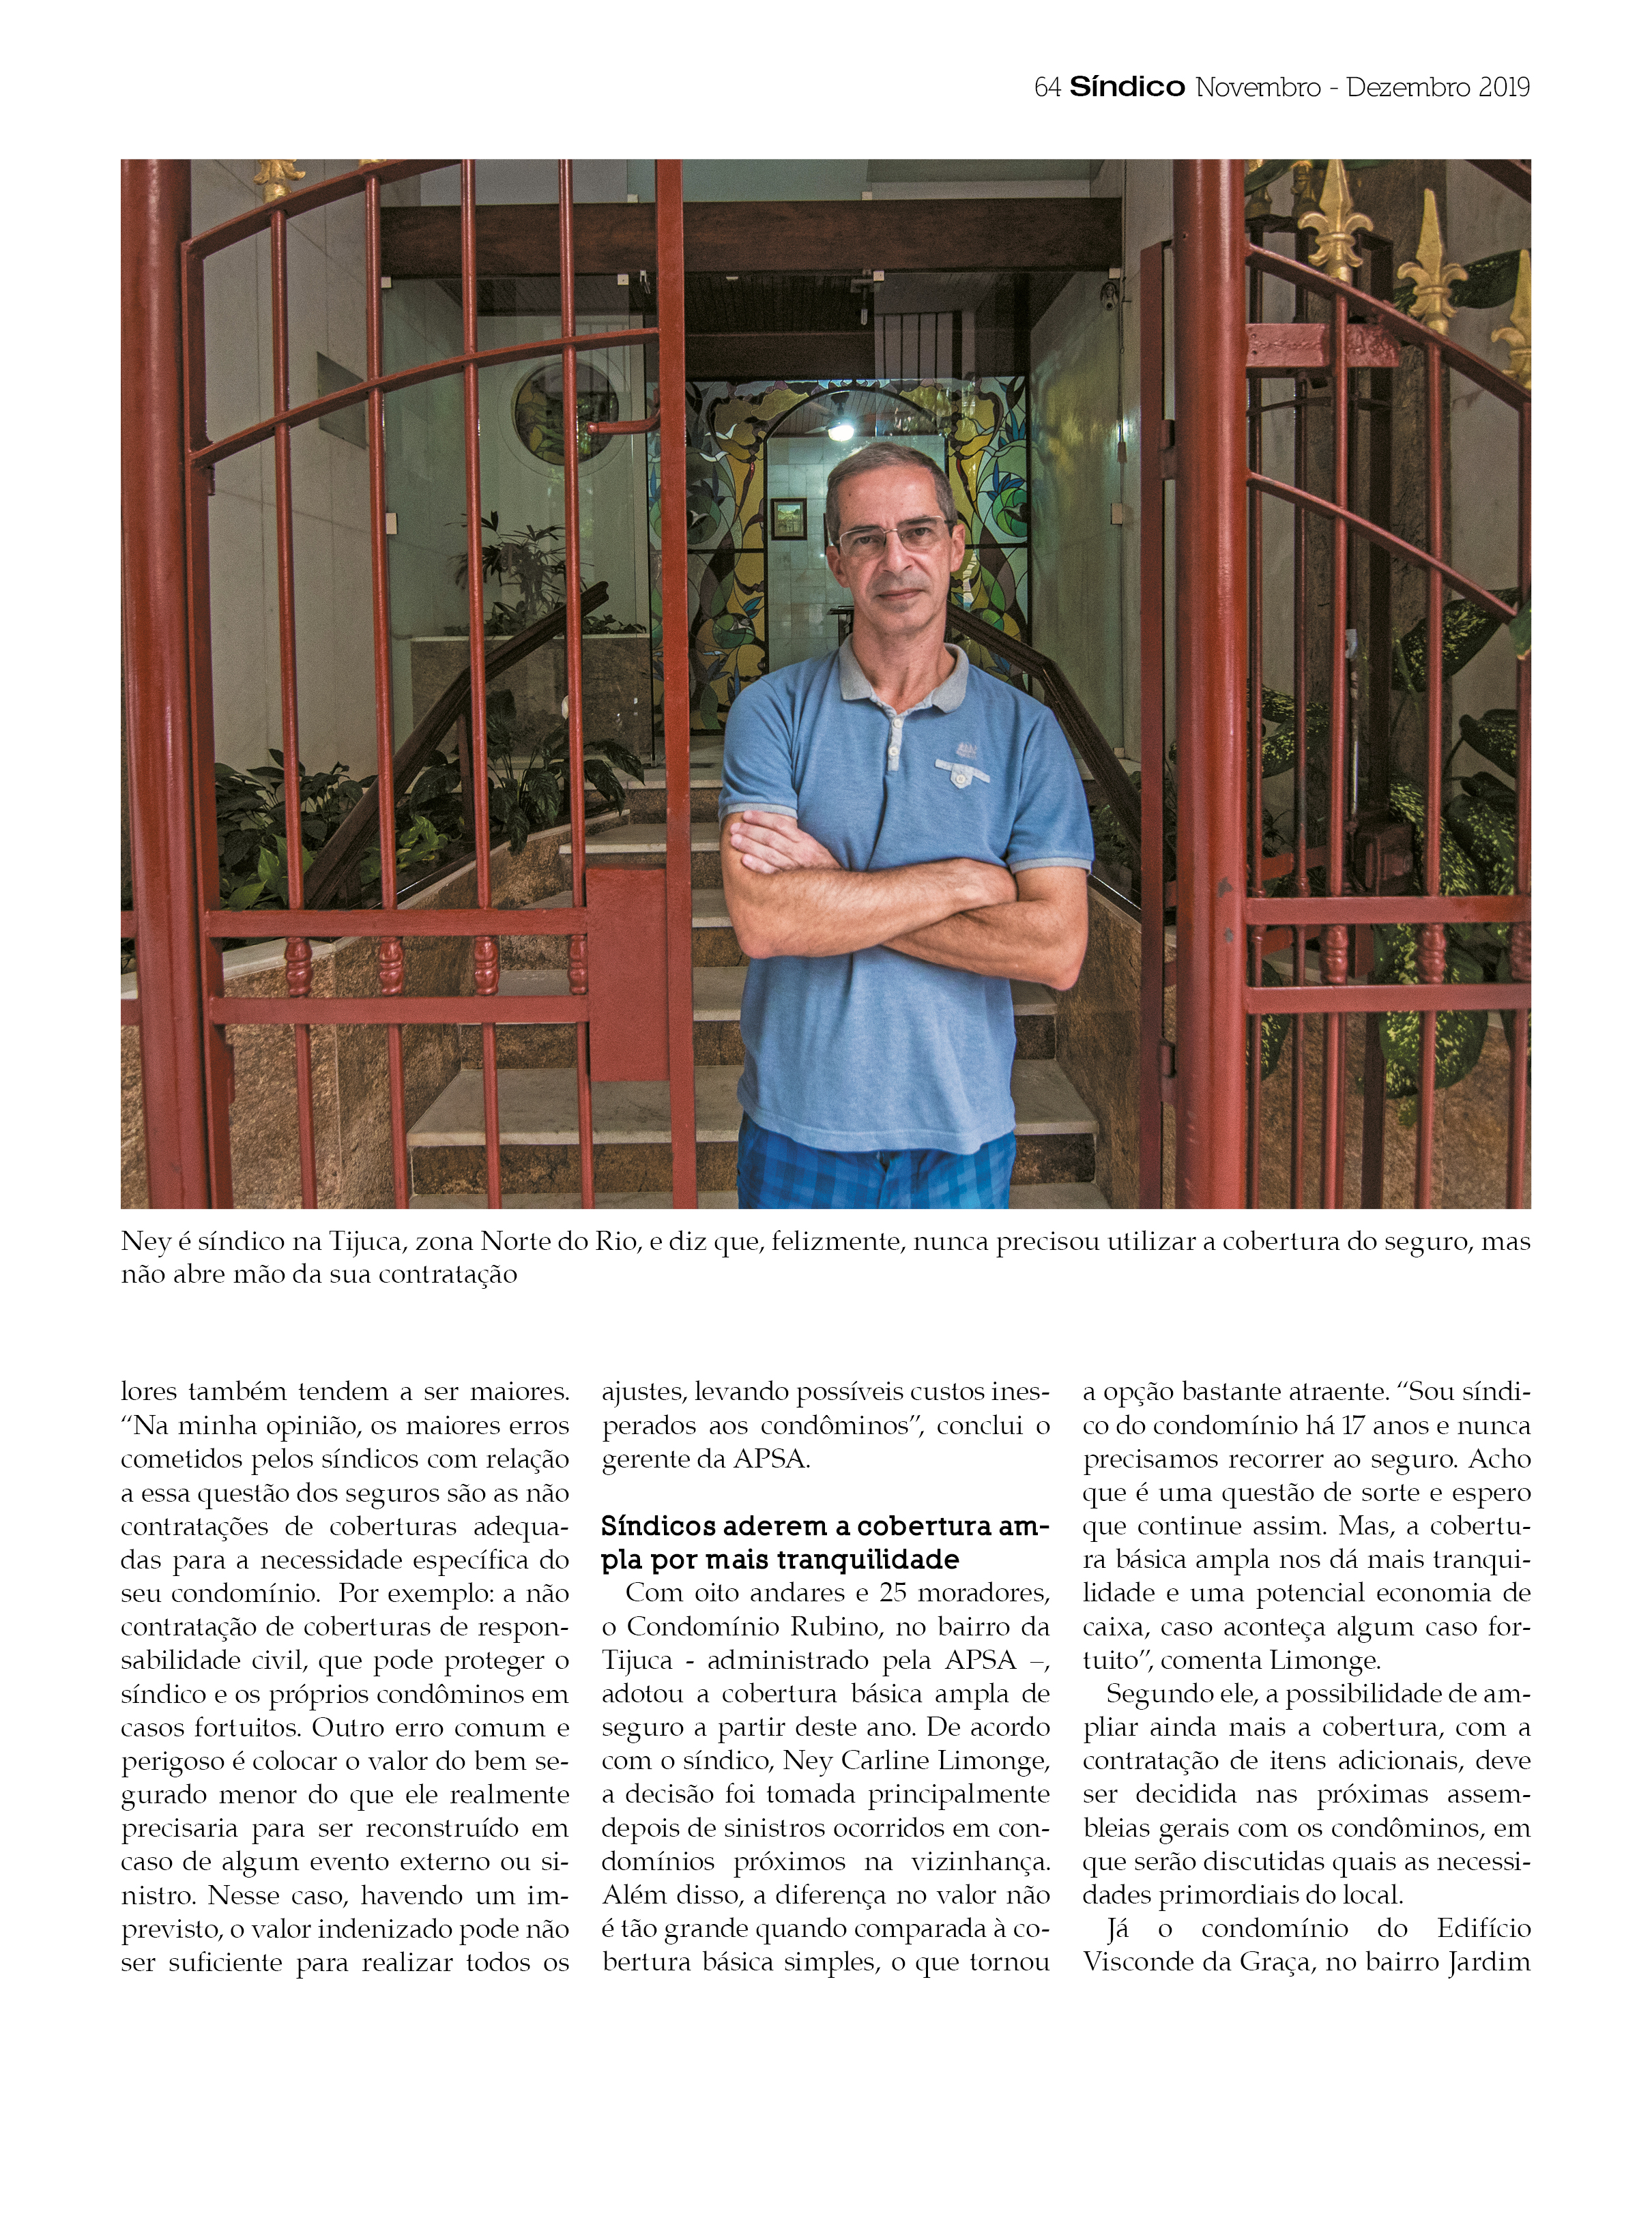 Revista Síndico_ed 247_62